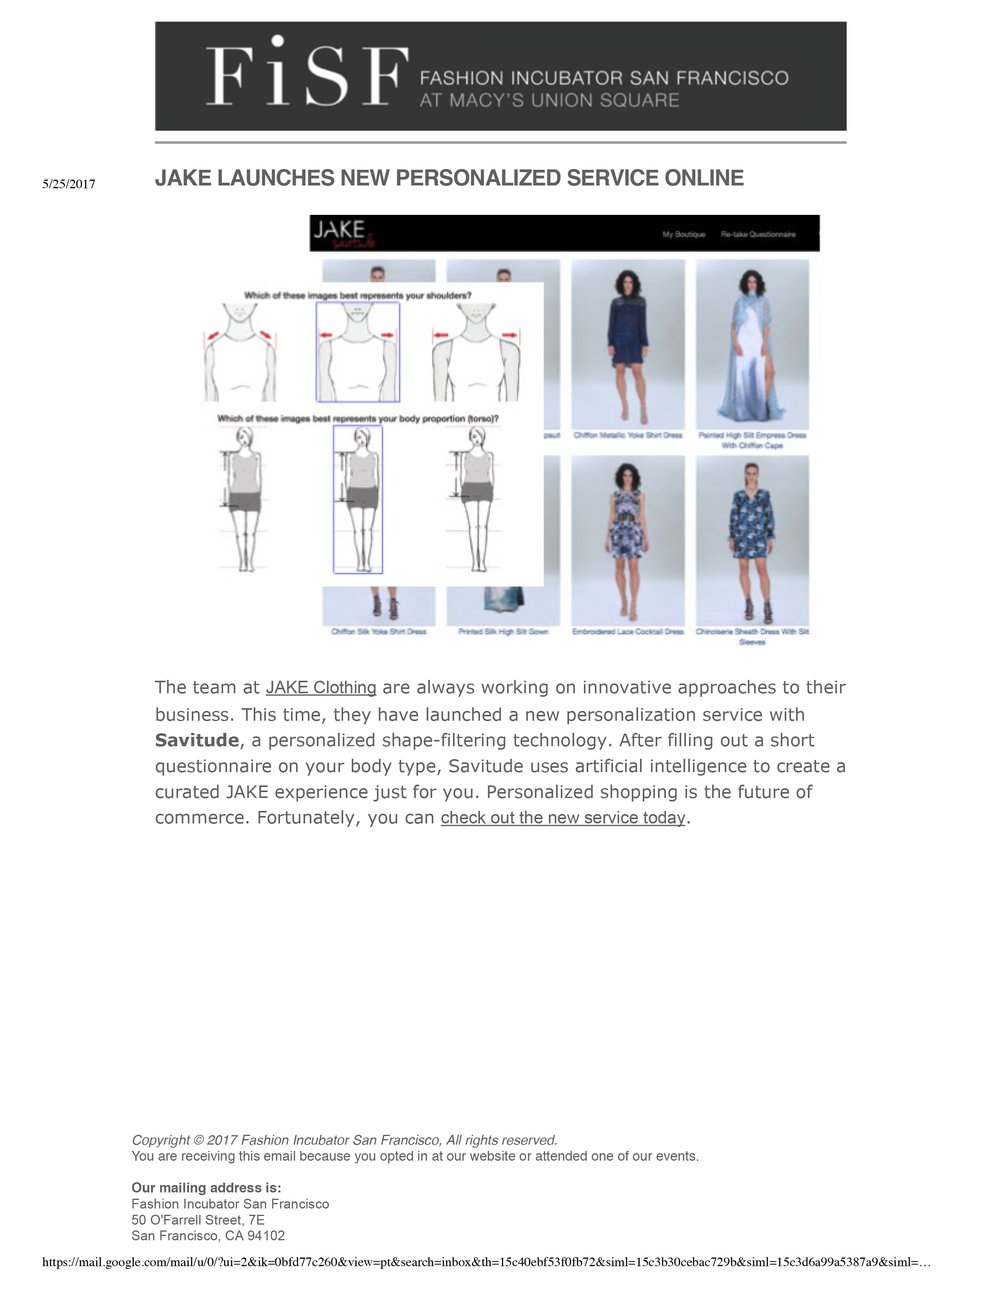 FiSF News _ Jake 5-24-17.jpg